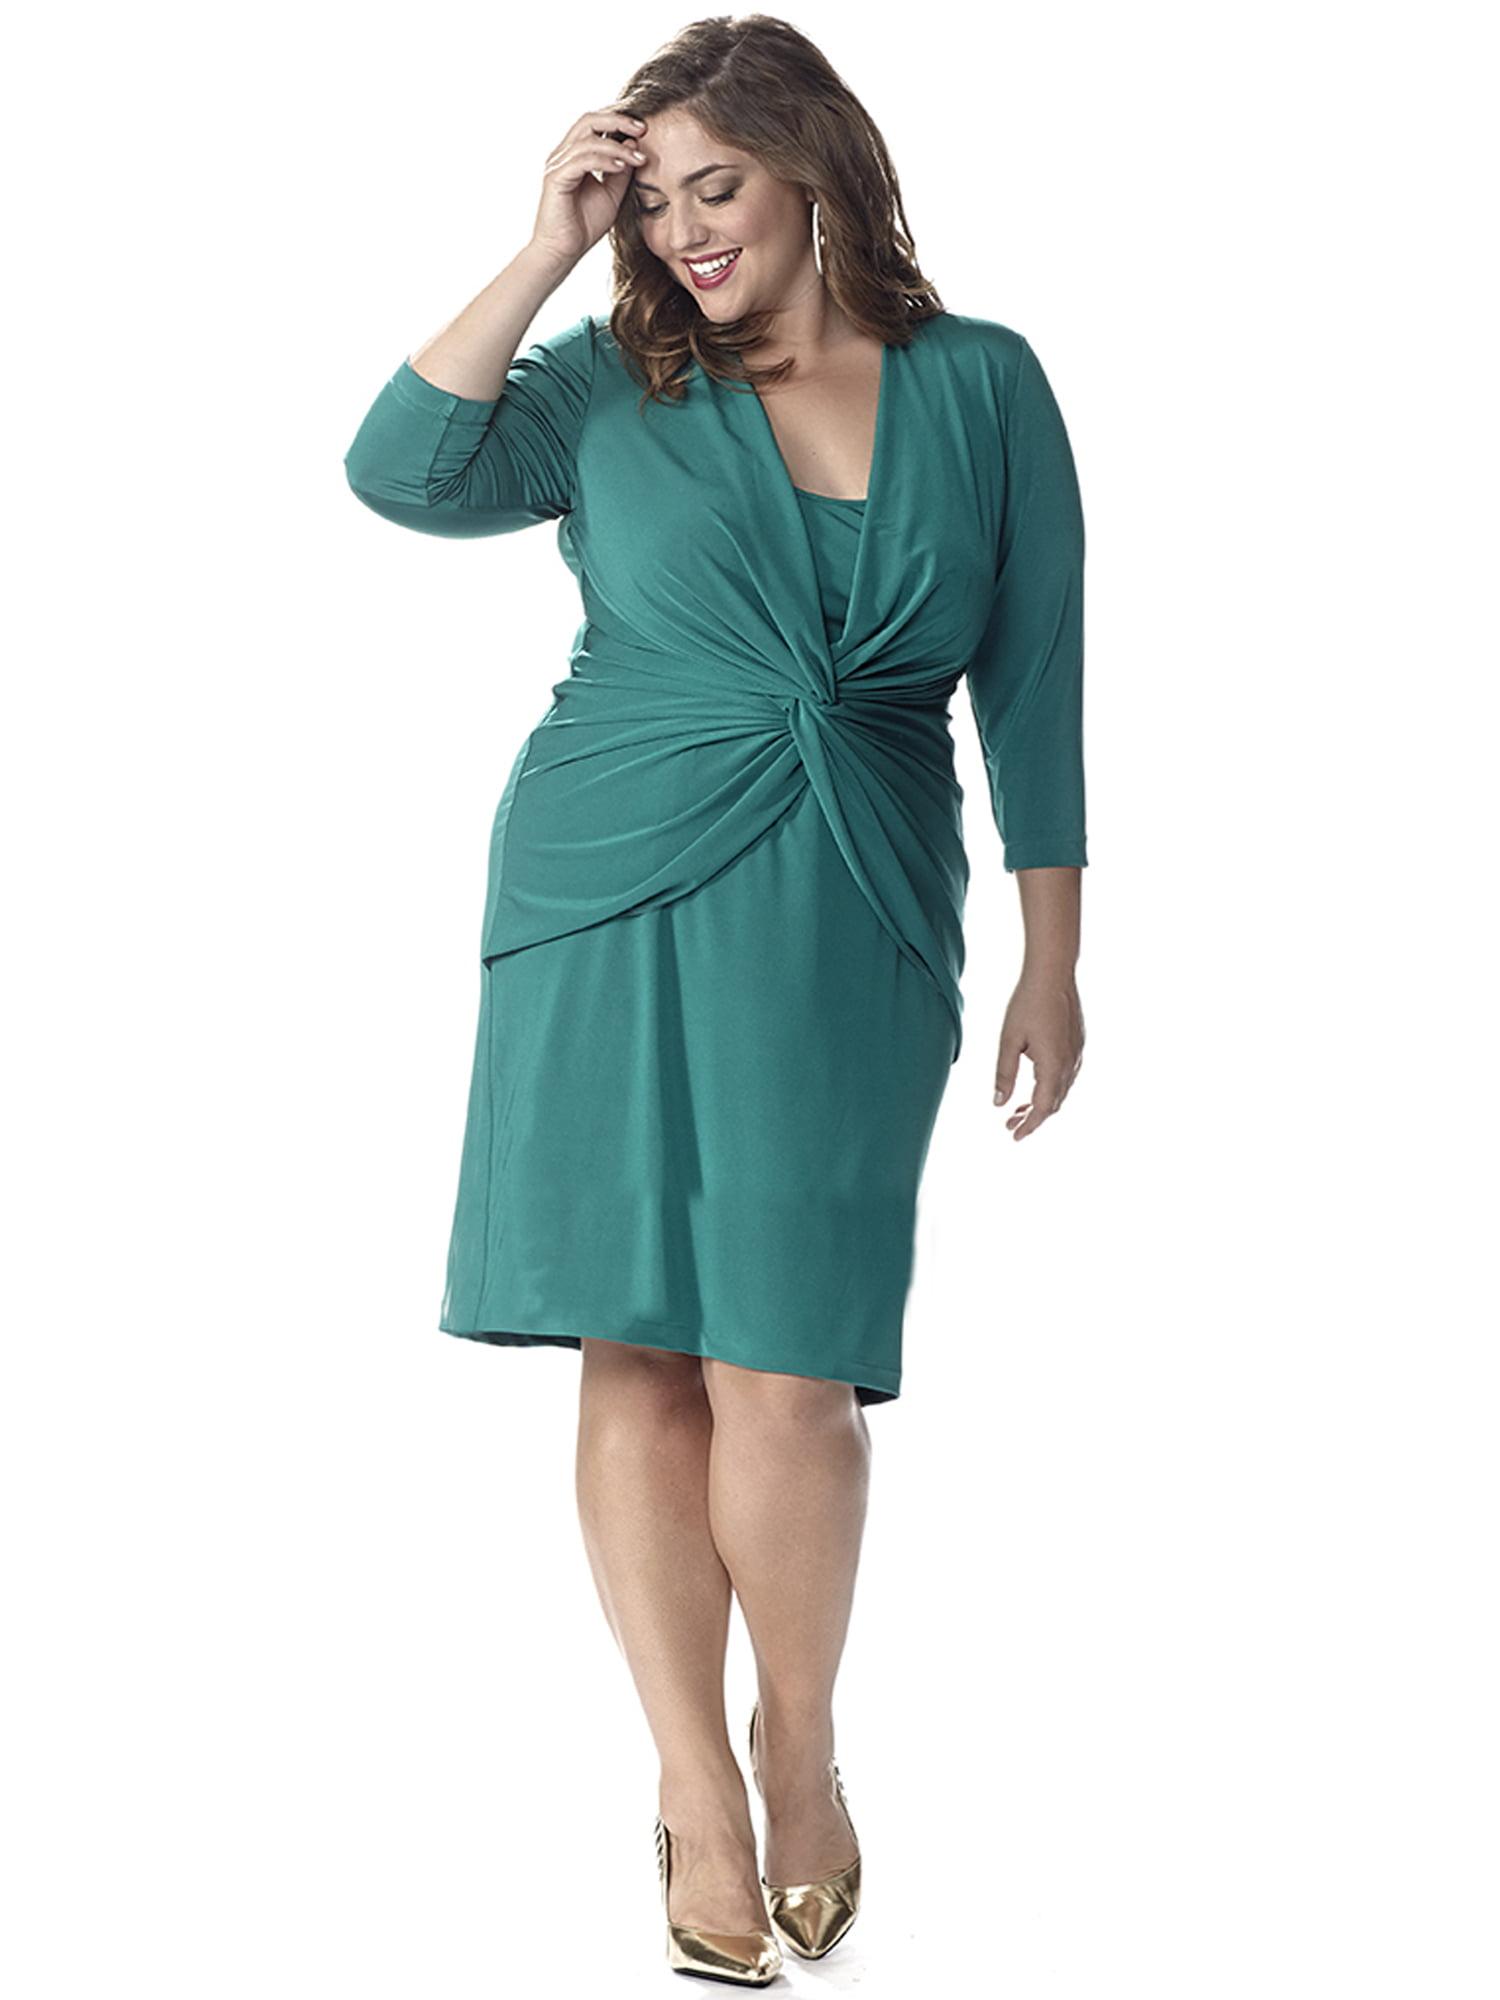 Celebrations by Sydney\'s Closet - Long Sleeve Plus Size Emerald Green Dress  with Trendy Knot Detail - Walmart.com